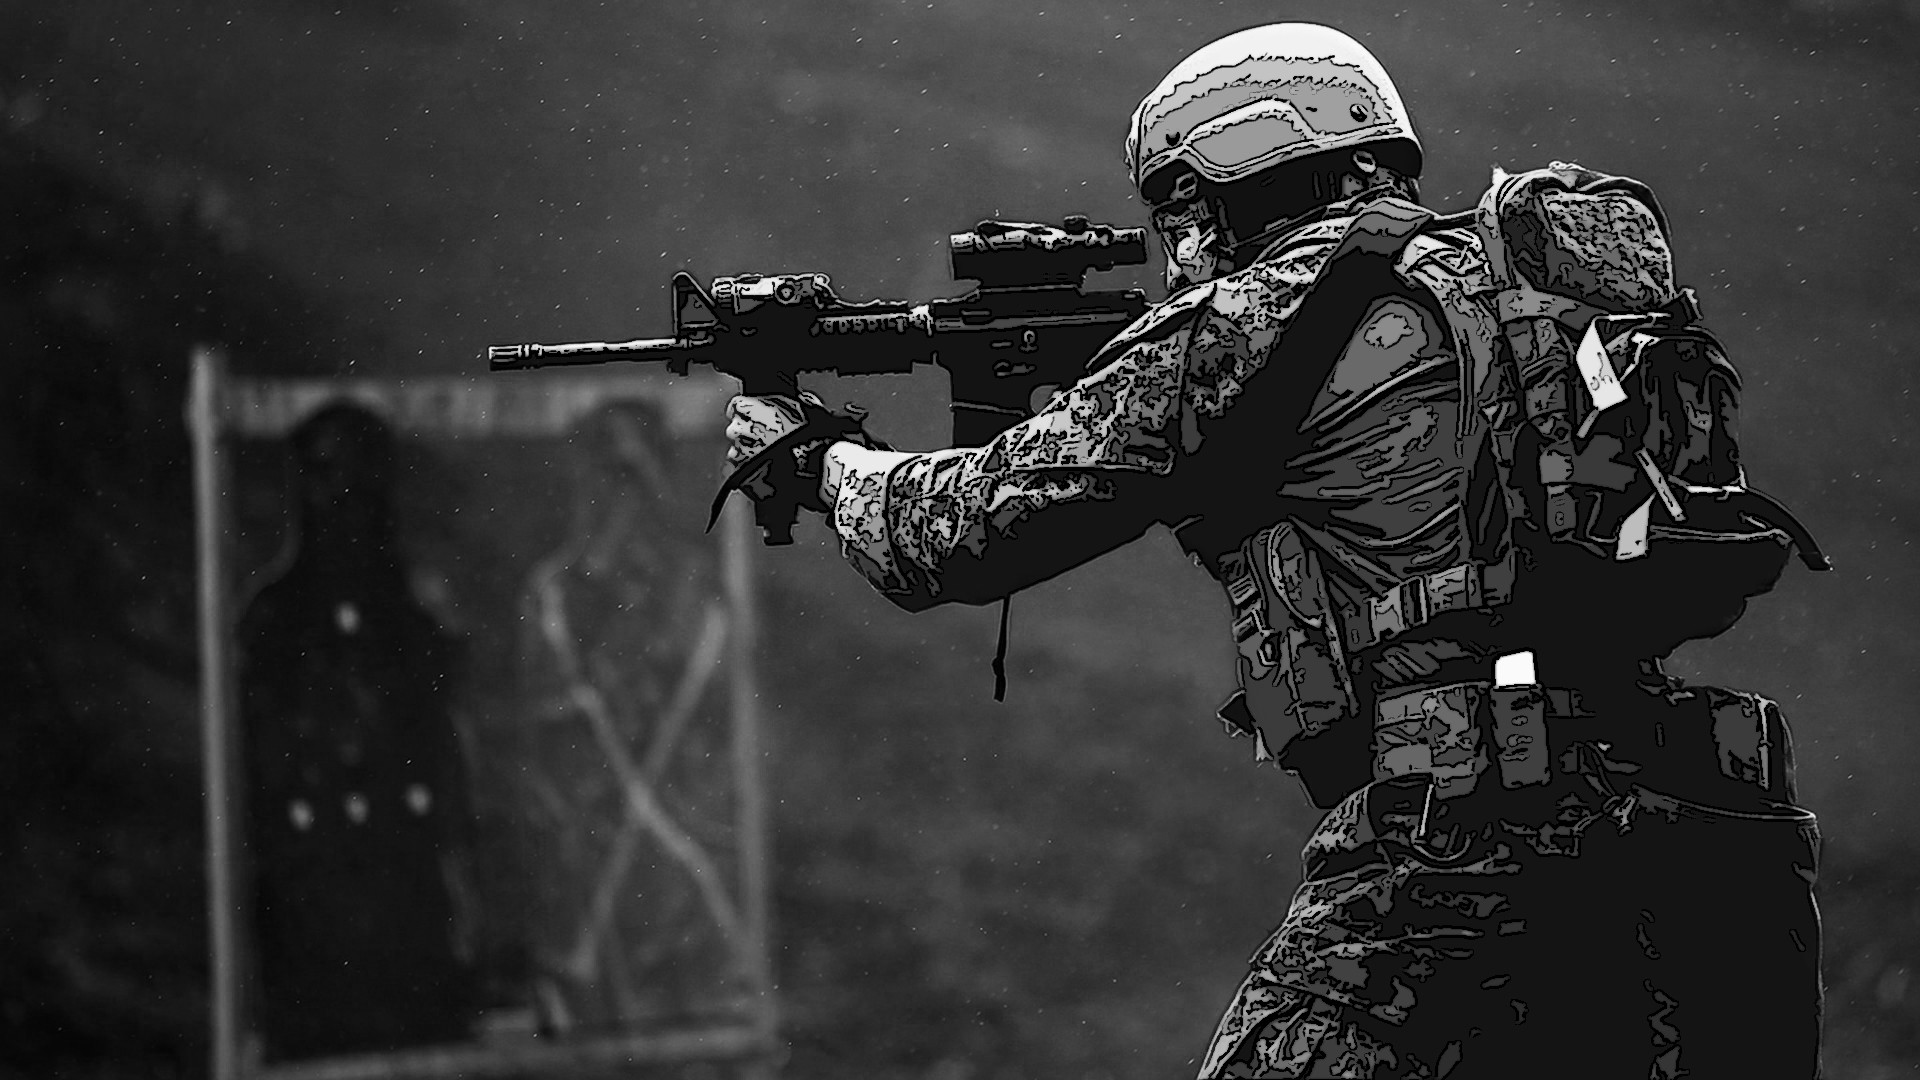 M4, united states marine corps, pohakuloa training area wallpapers .